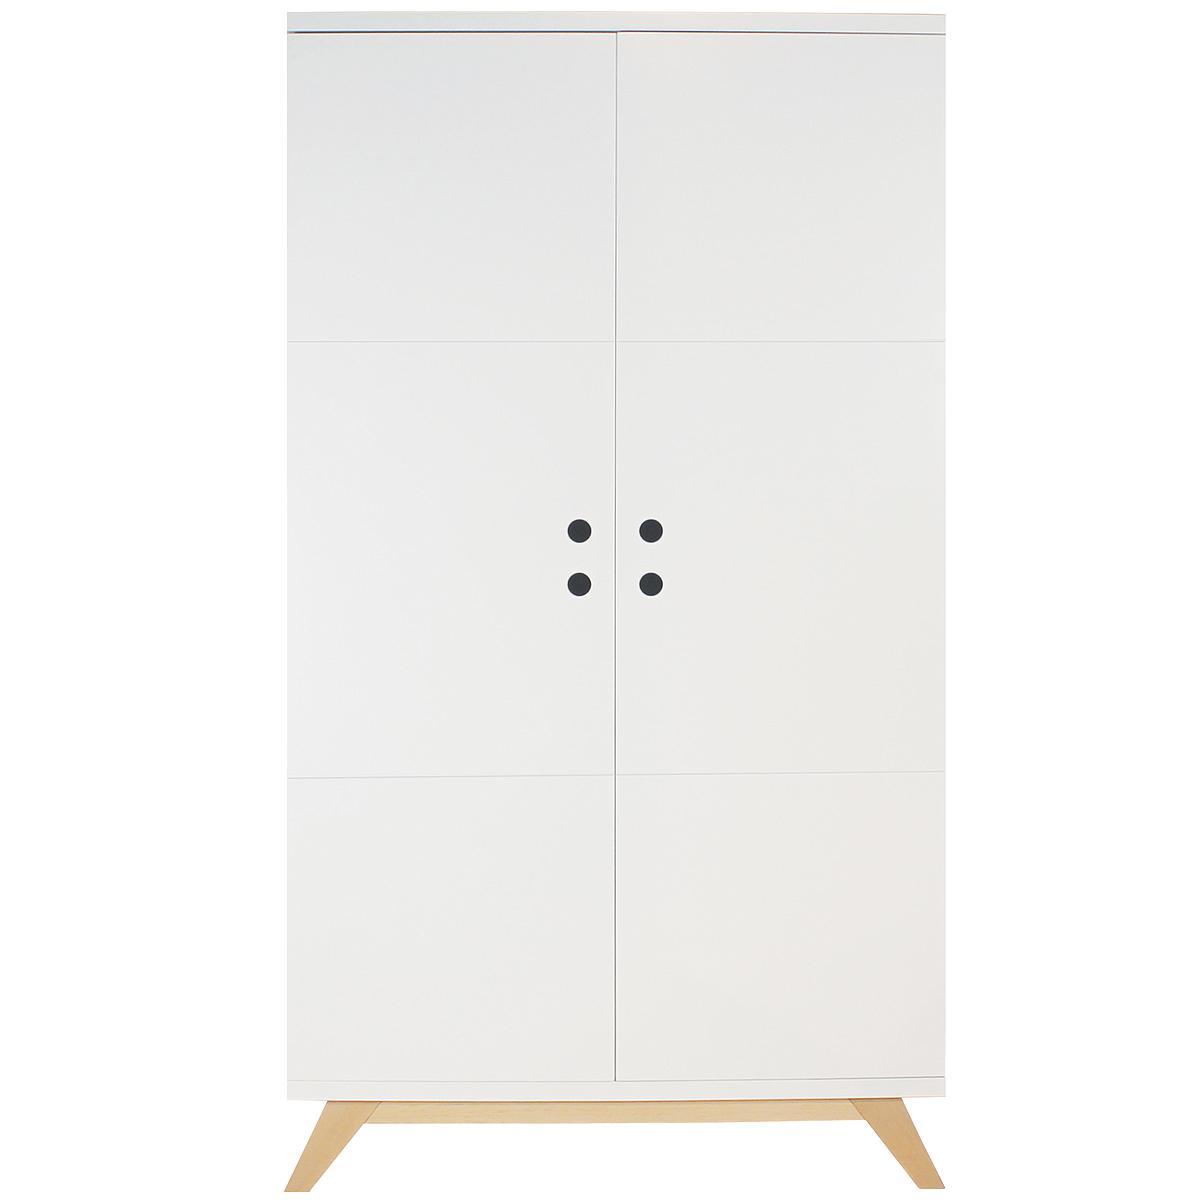 Kleiderschrank 2 Türen LYNN Bopita weiß-natur